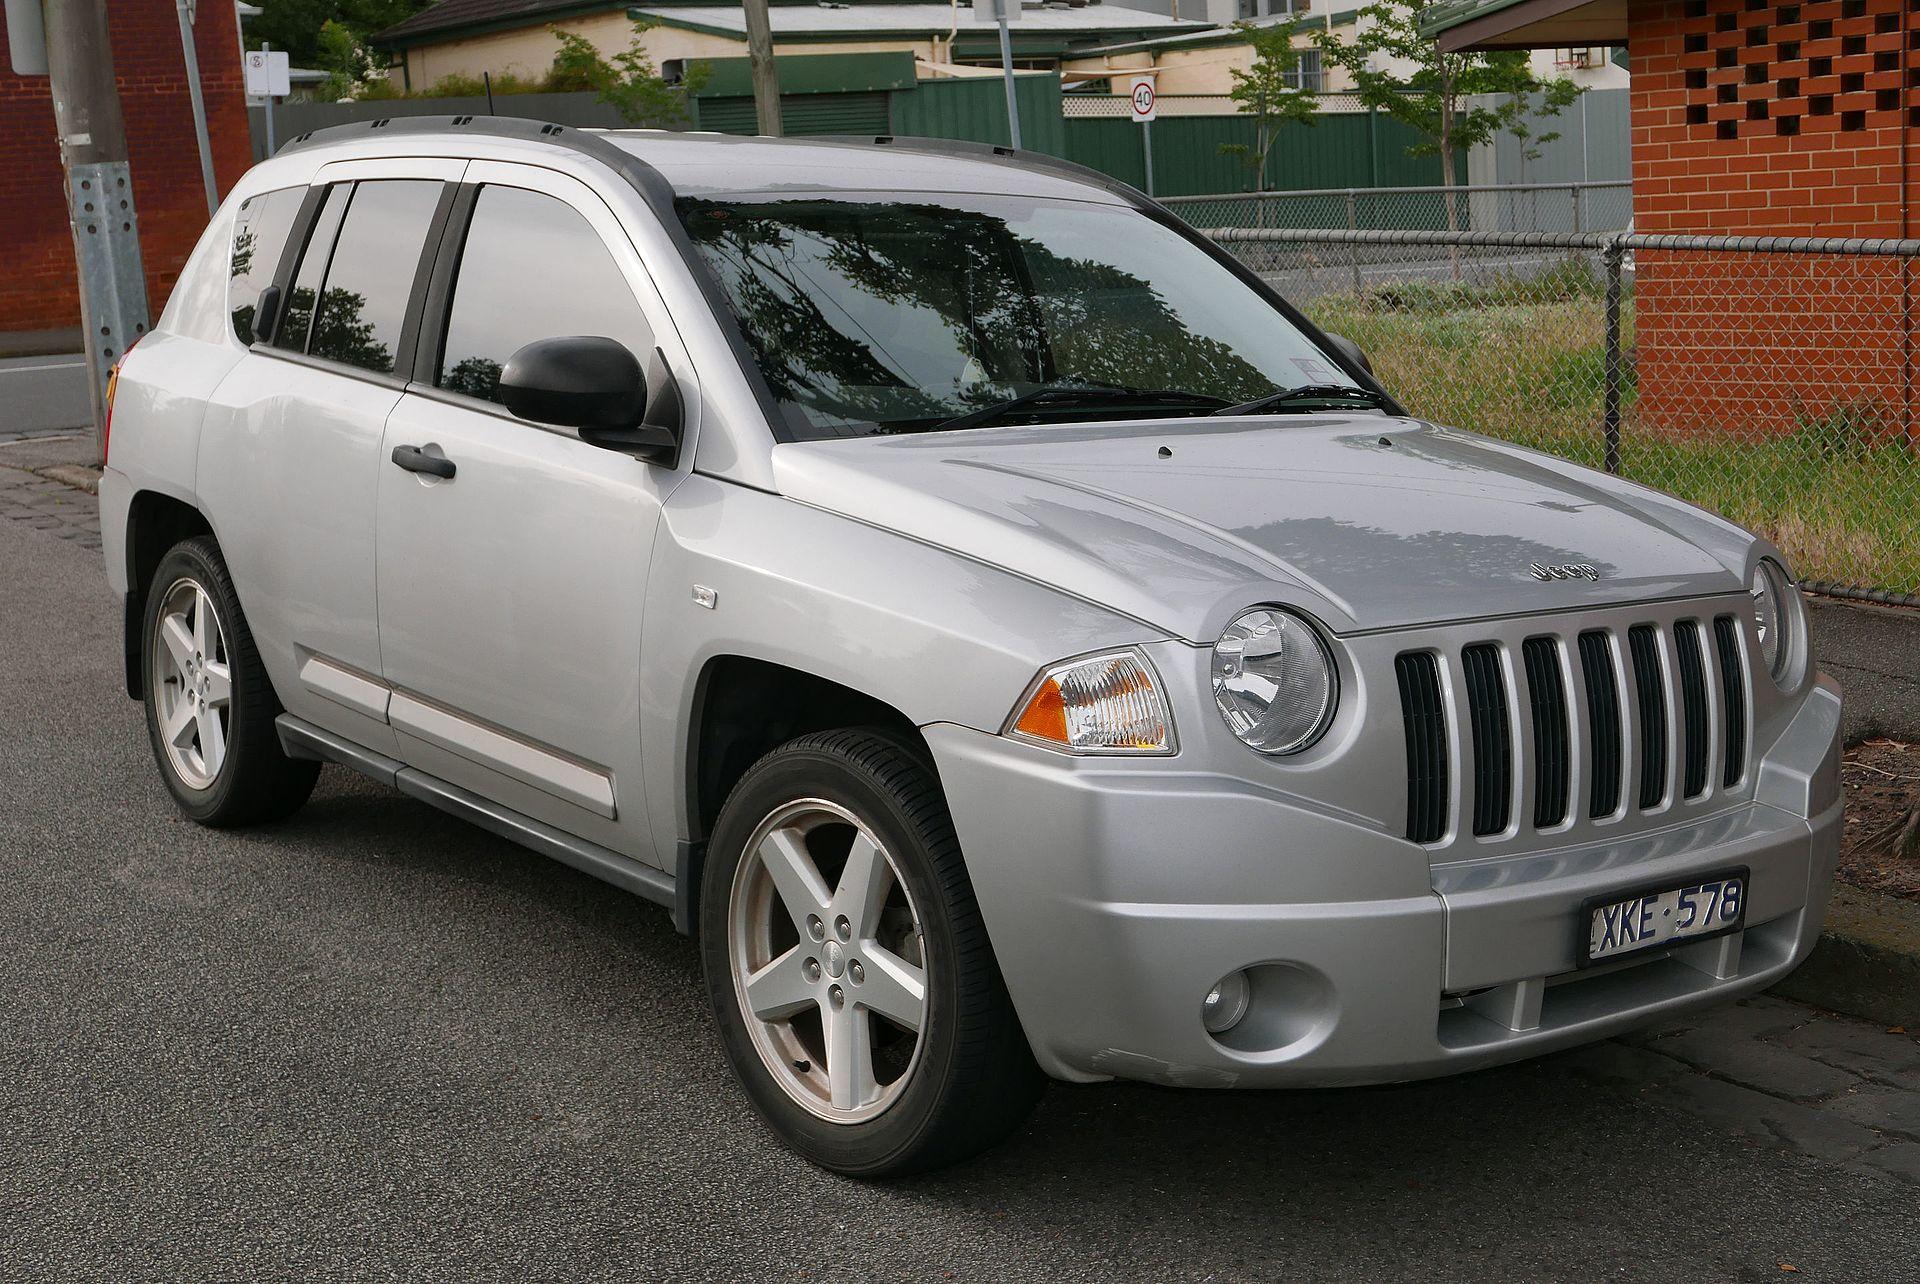 2008 Jeep Compass (MK MY08) Limited 2.4 wagon (2015-11-11) 01.jpg